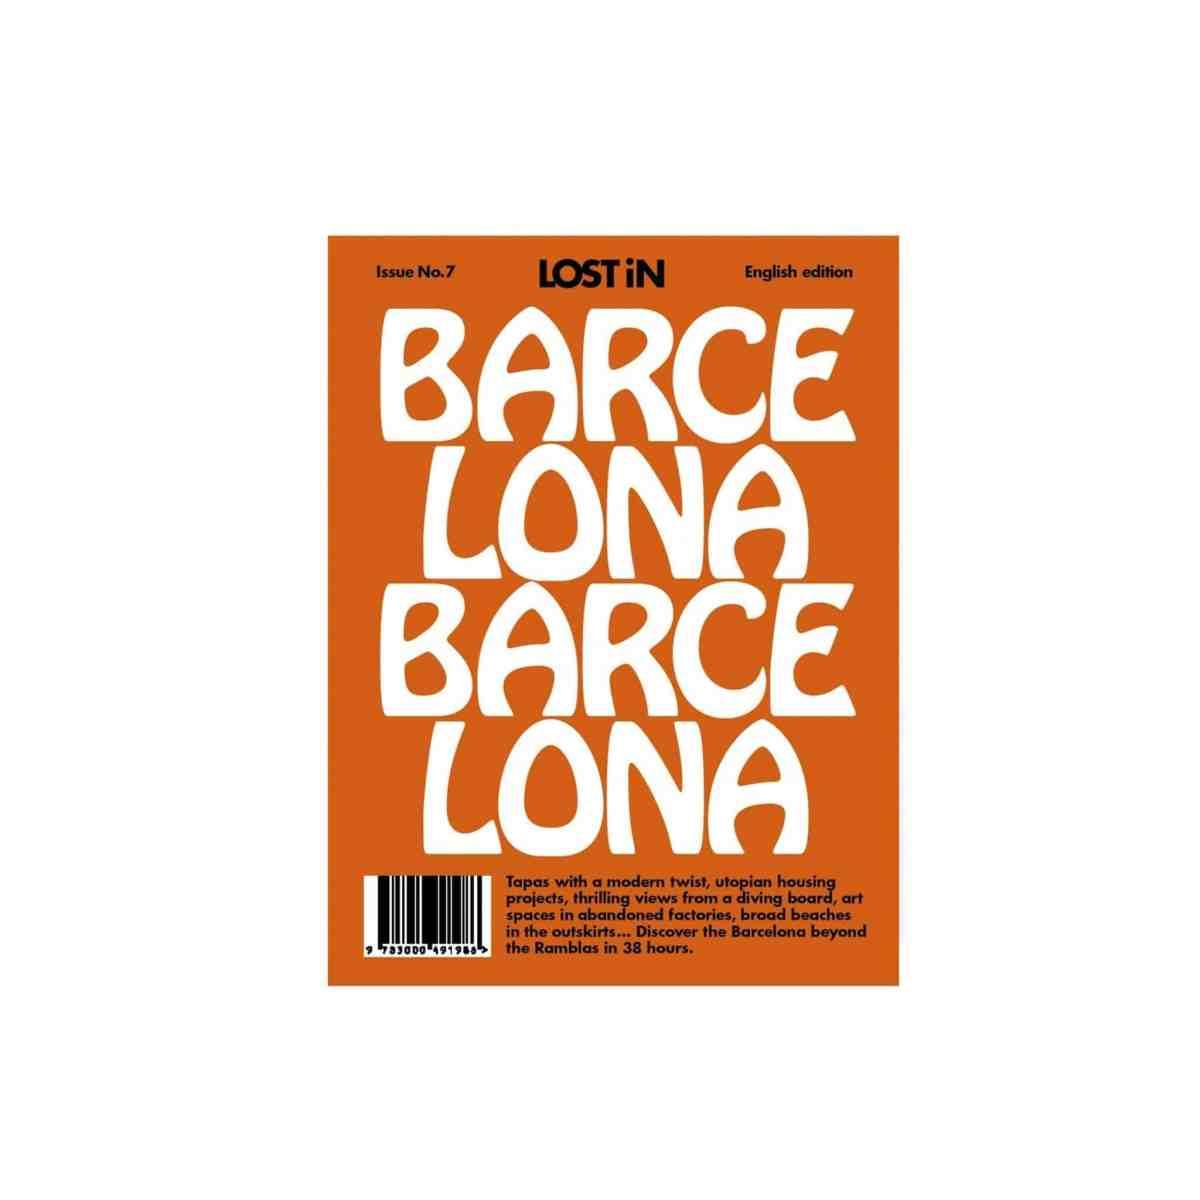 38-hour-travel-guide-barcelona-001